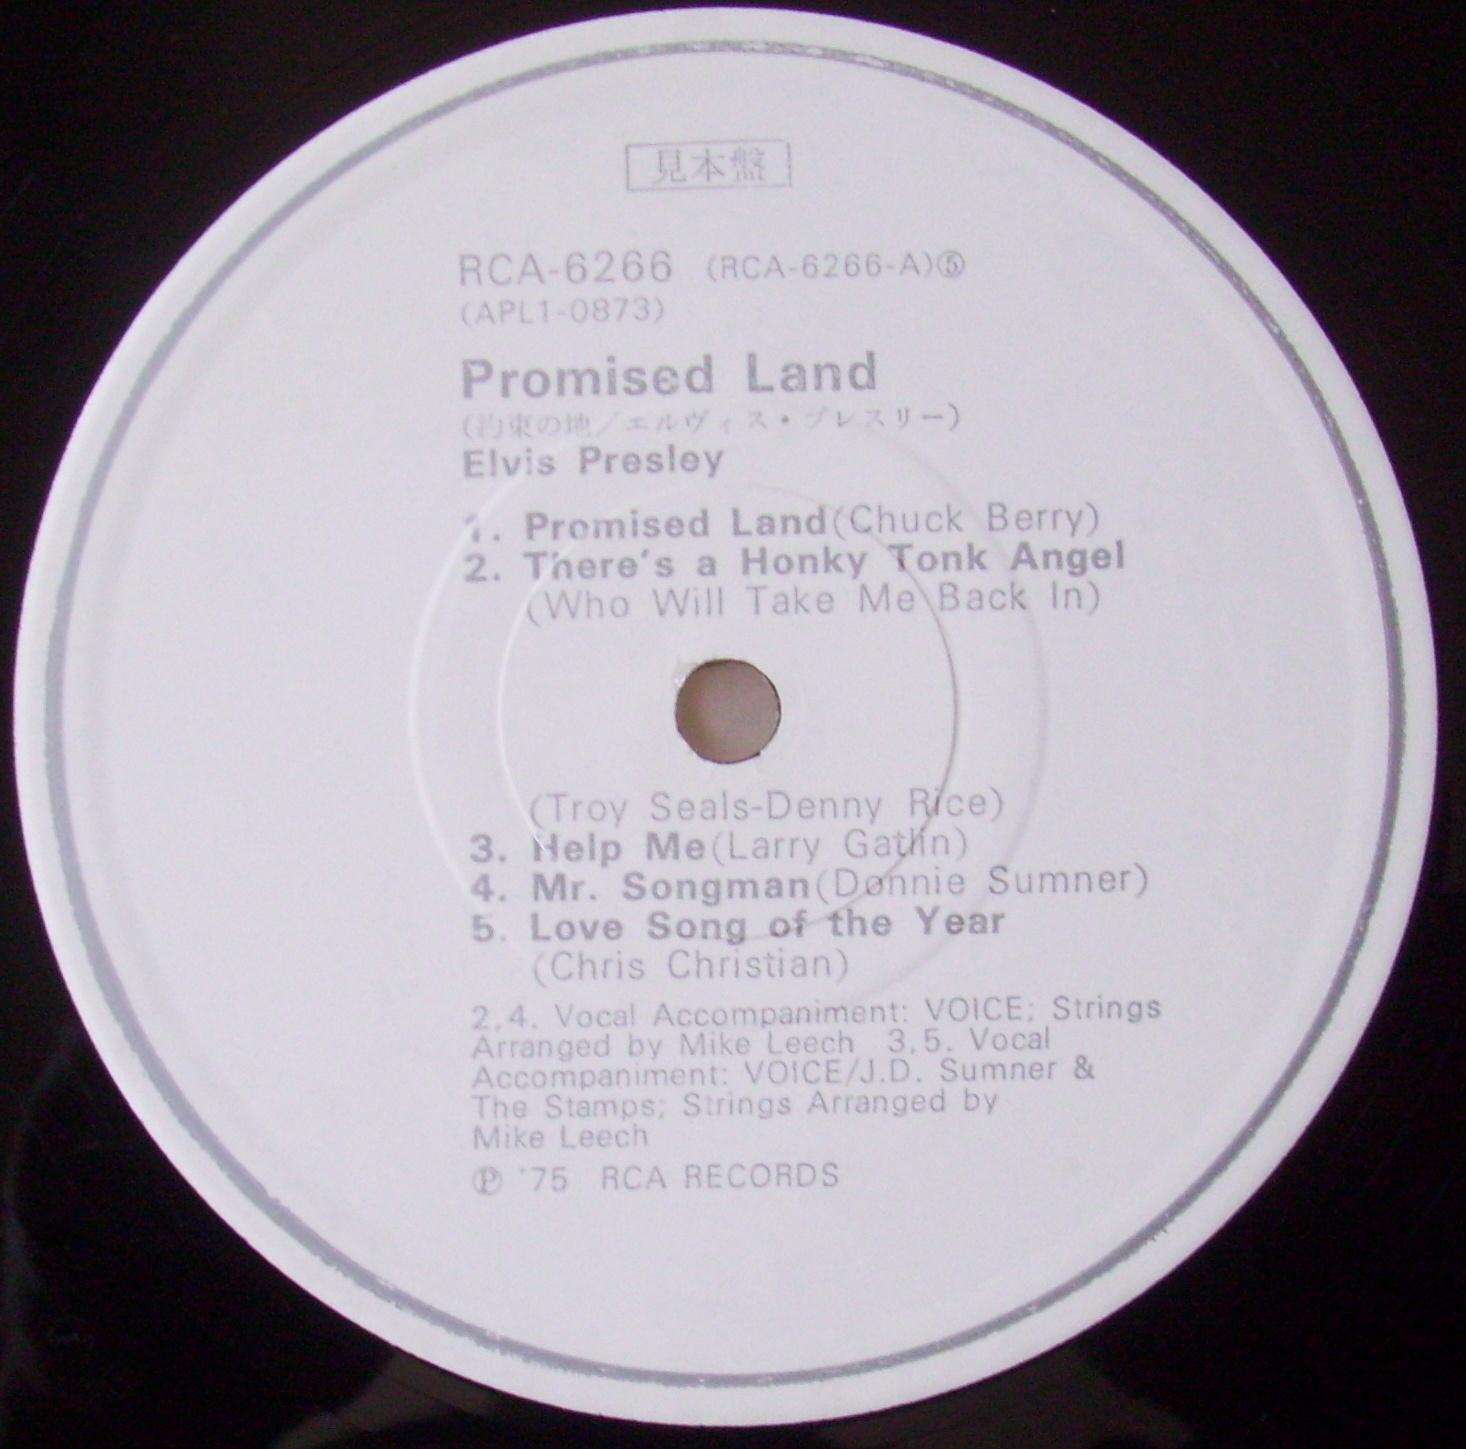 PROMISED LAND 648ro38t